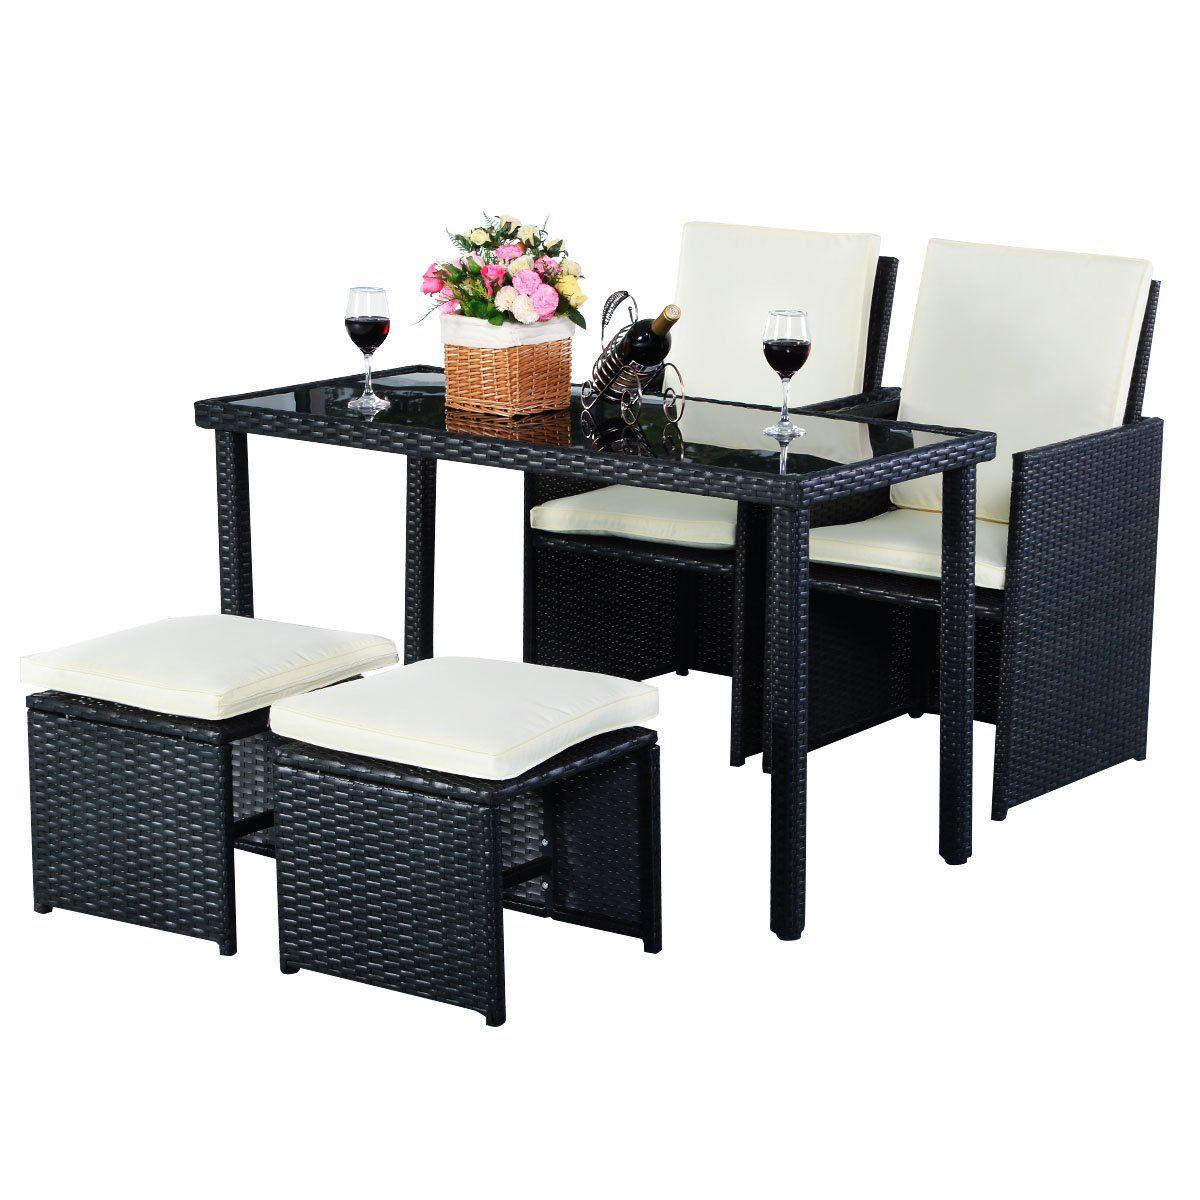 Tangkula Patio Furniture Outdoor Wicker Rattan Dining Set